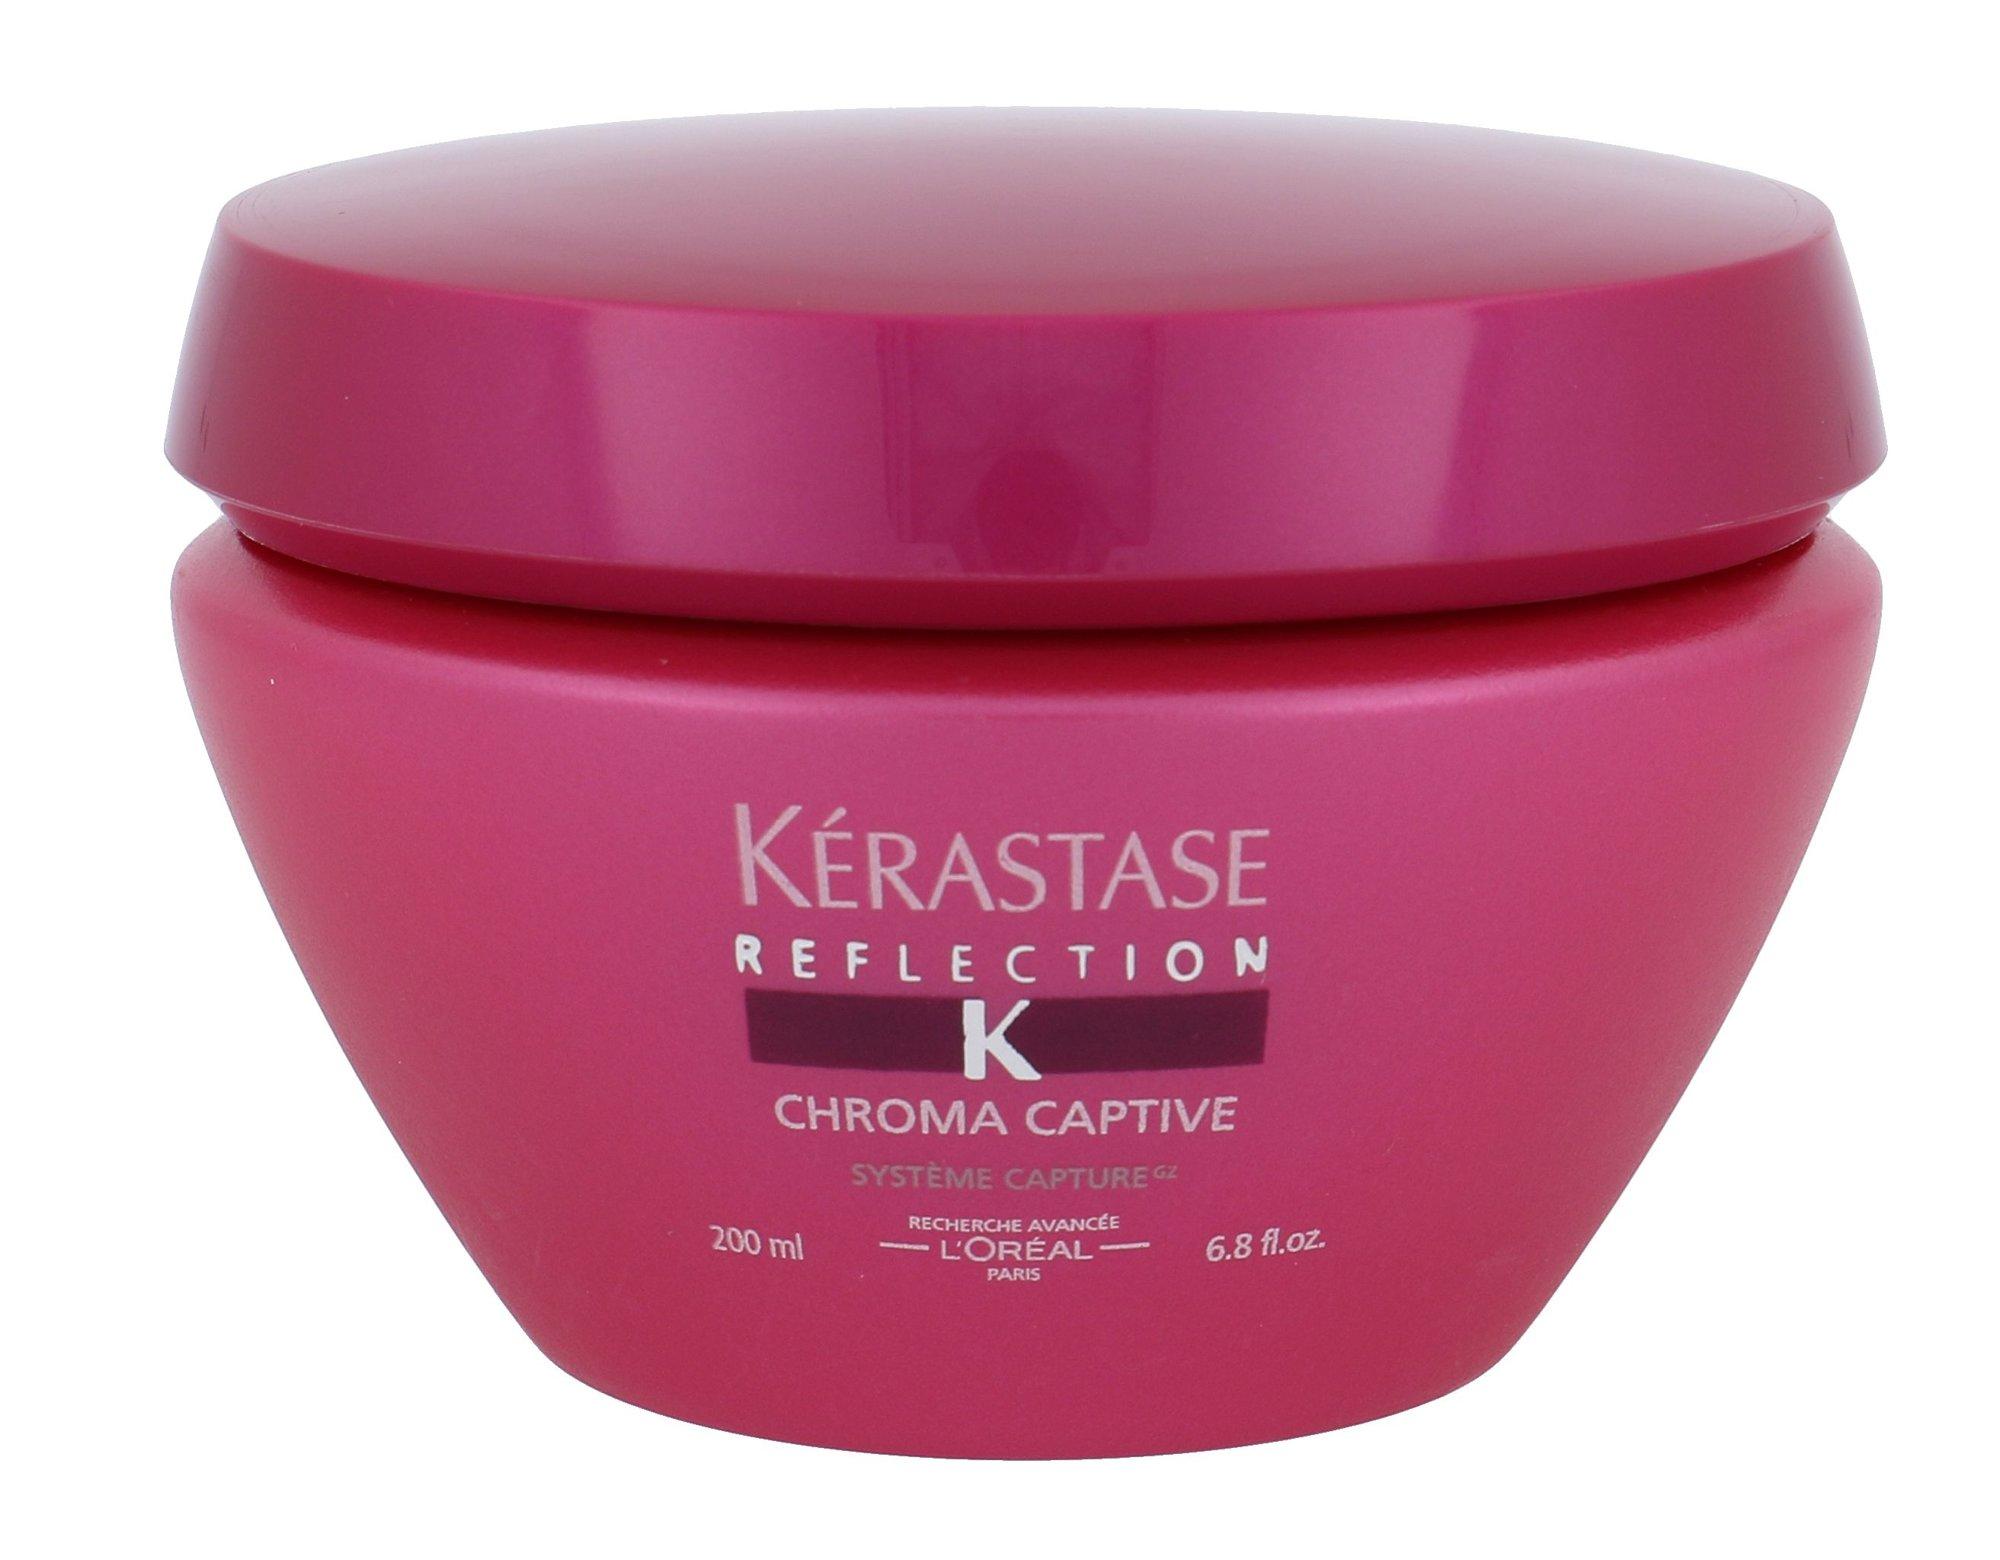 Kérastase Réflection Cosmetic 200ml